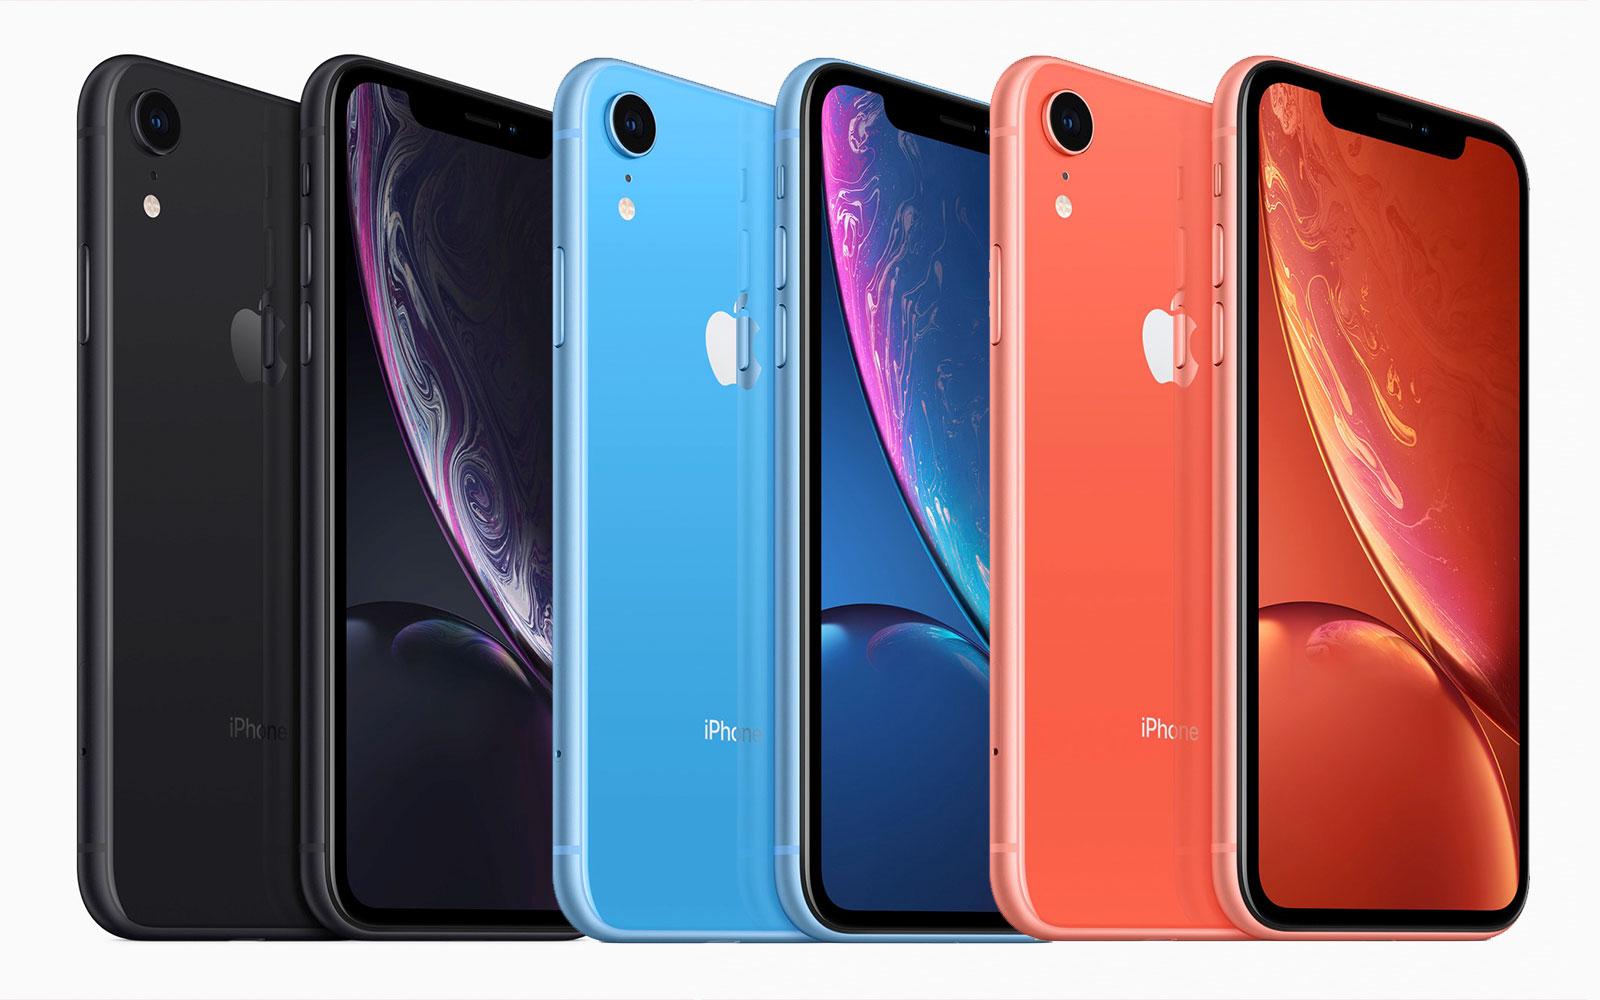 iPhone XR : un iPhone X plus accessible